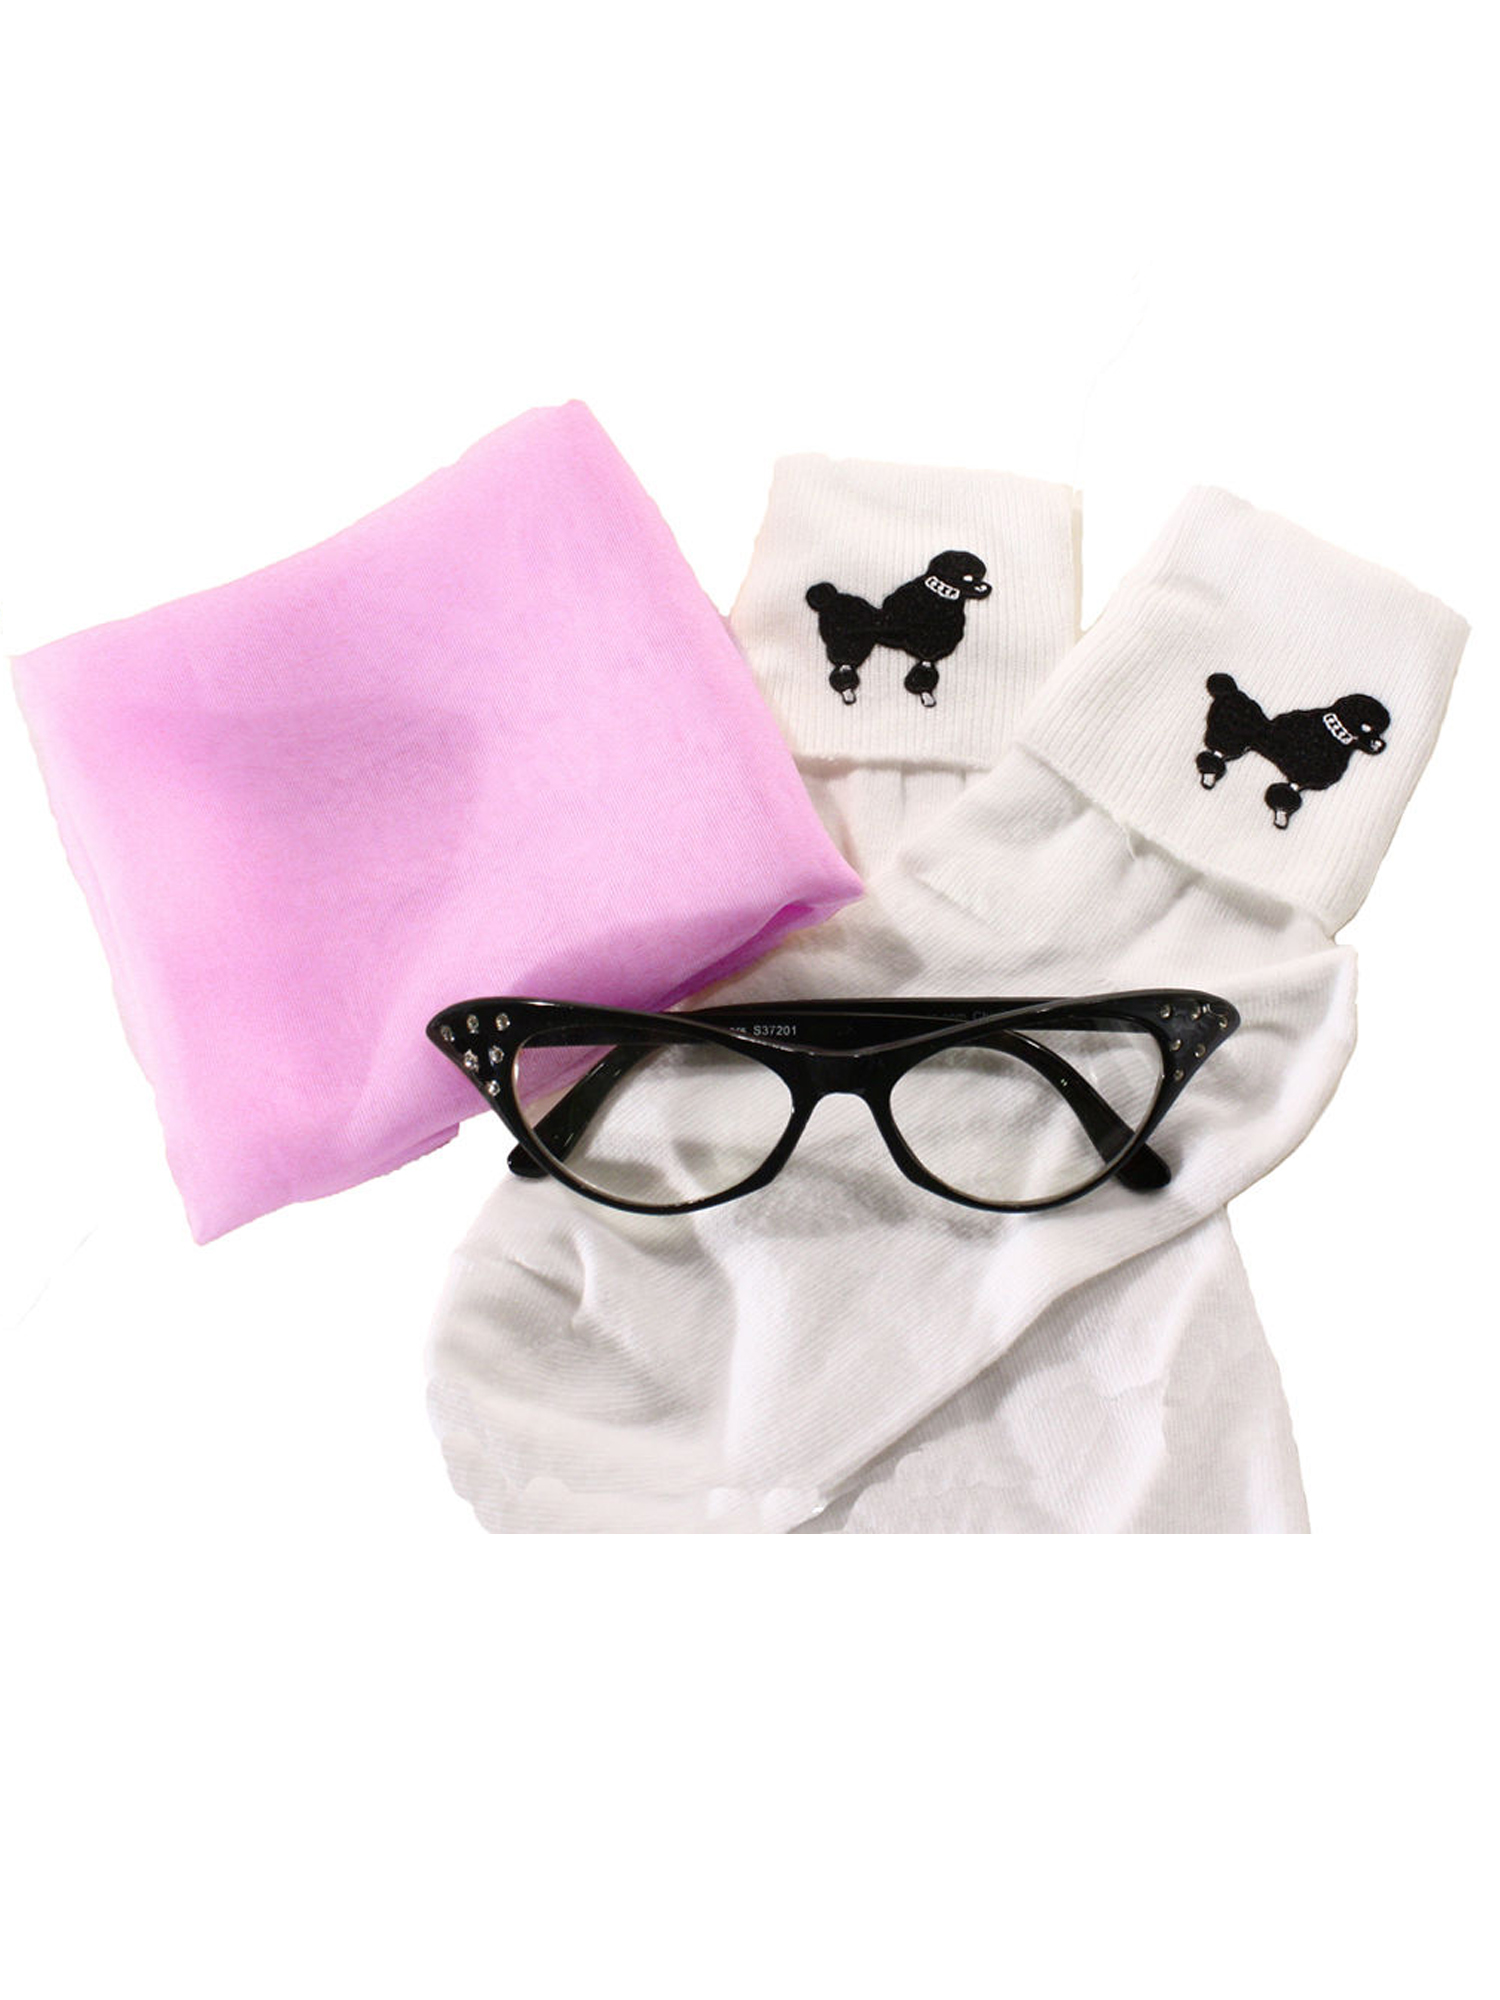 Clear Lens Hey Viv Retro Fun Colors 50s Style Cat Eye Glasses w Rhinestones